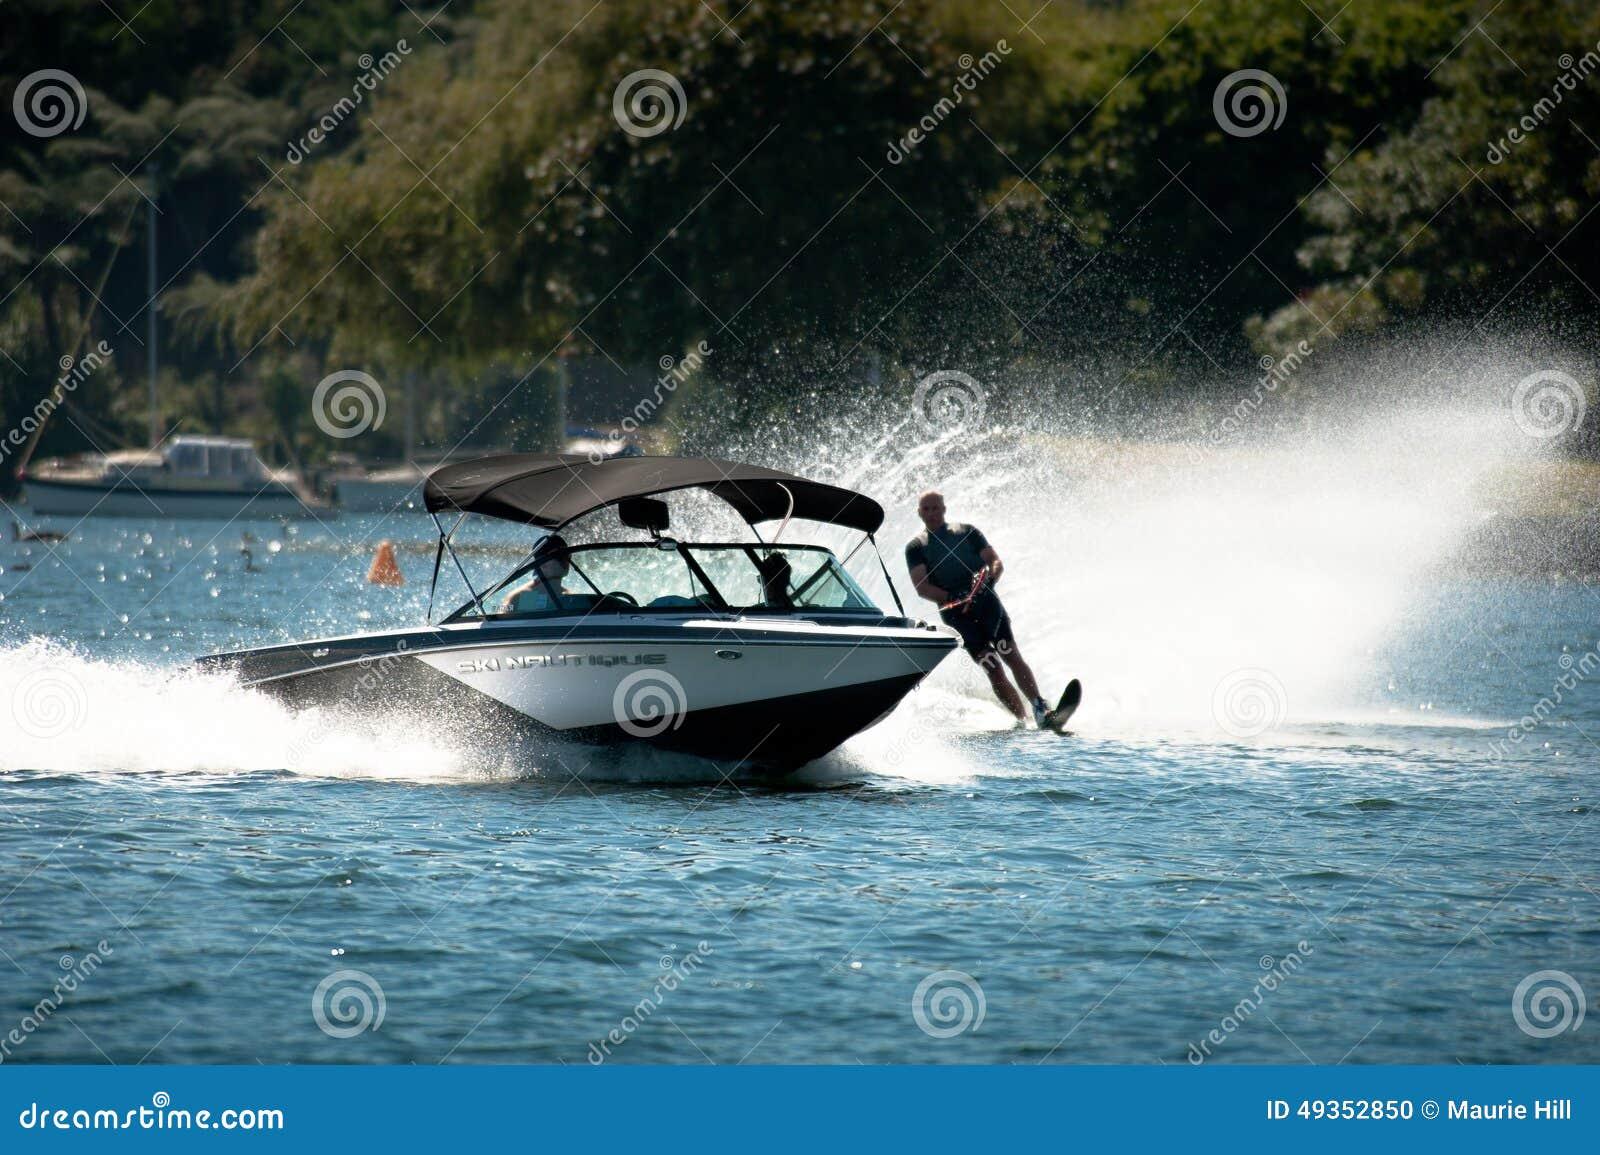 Water Skiing Slalom Action Editorial Image - Image: 49352850